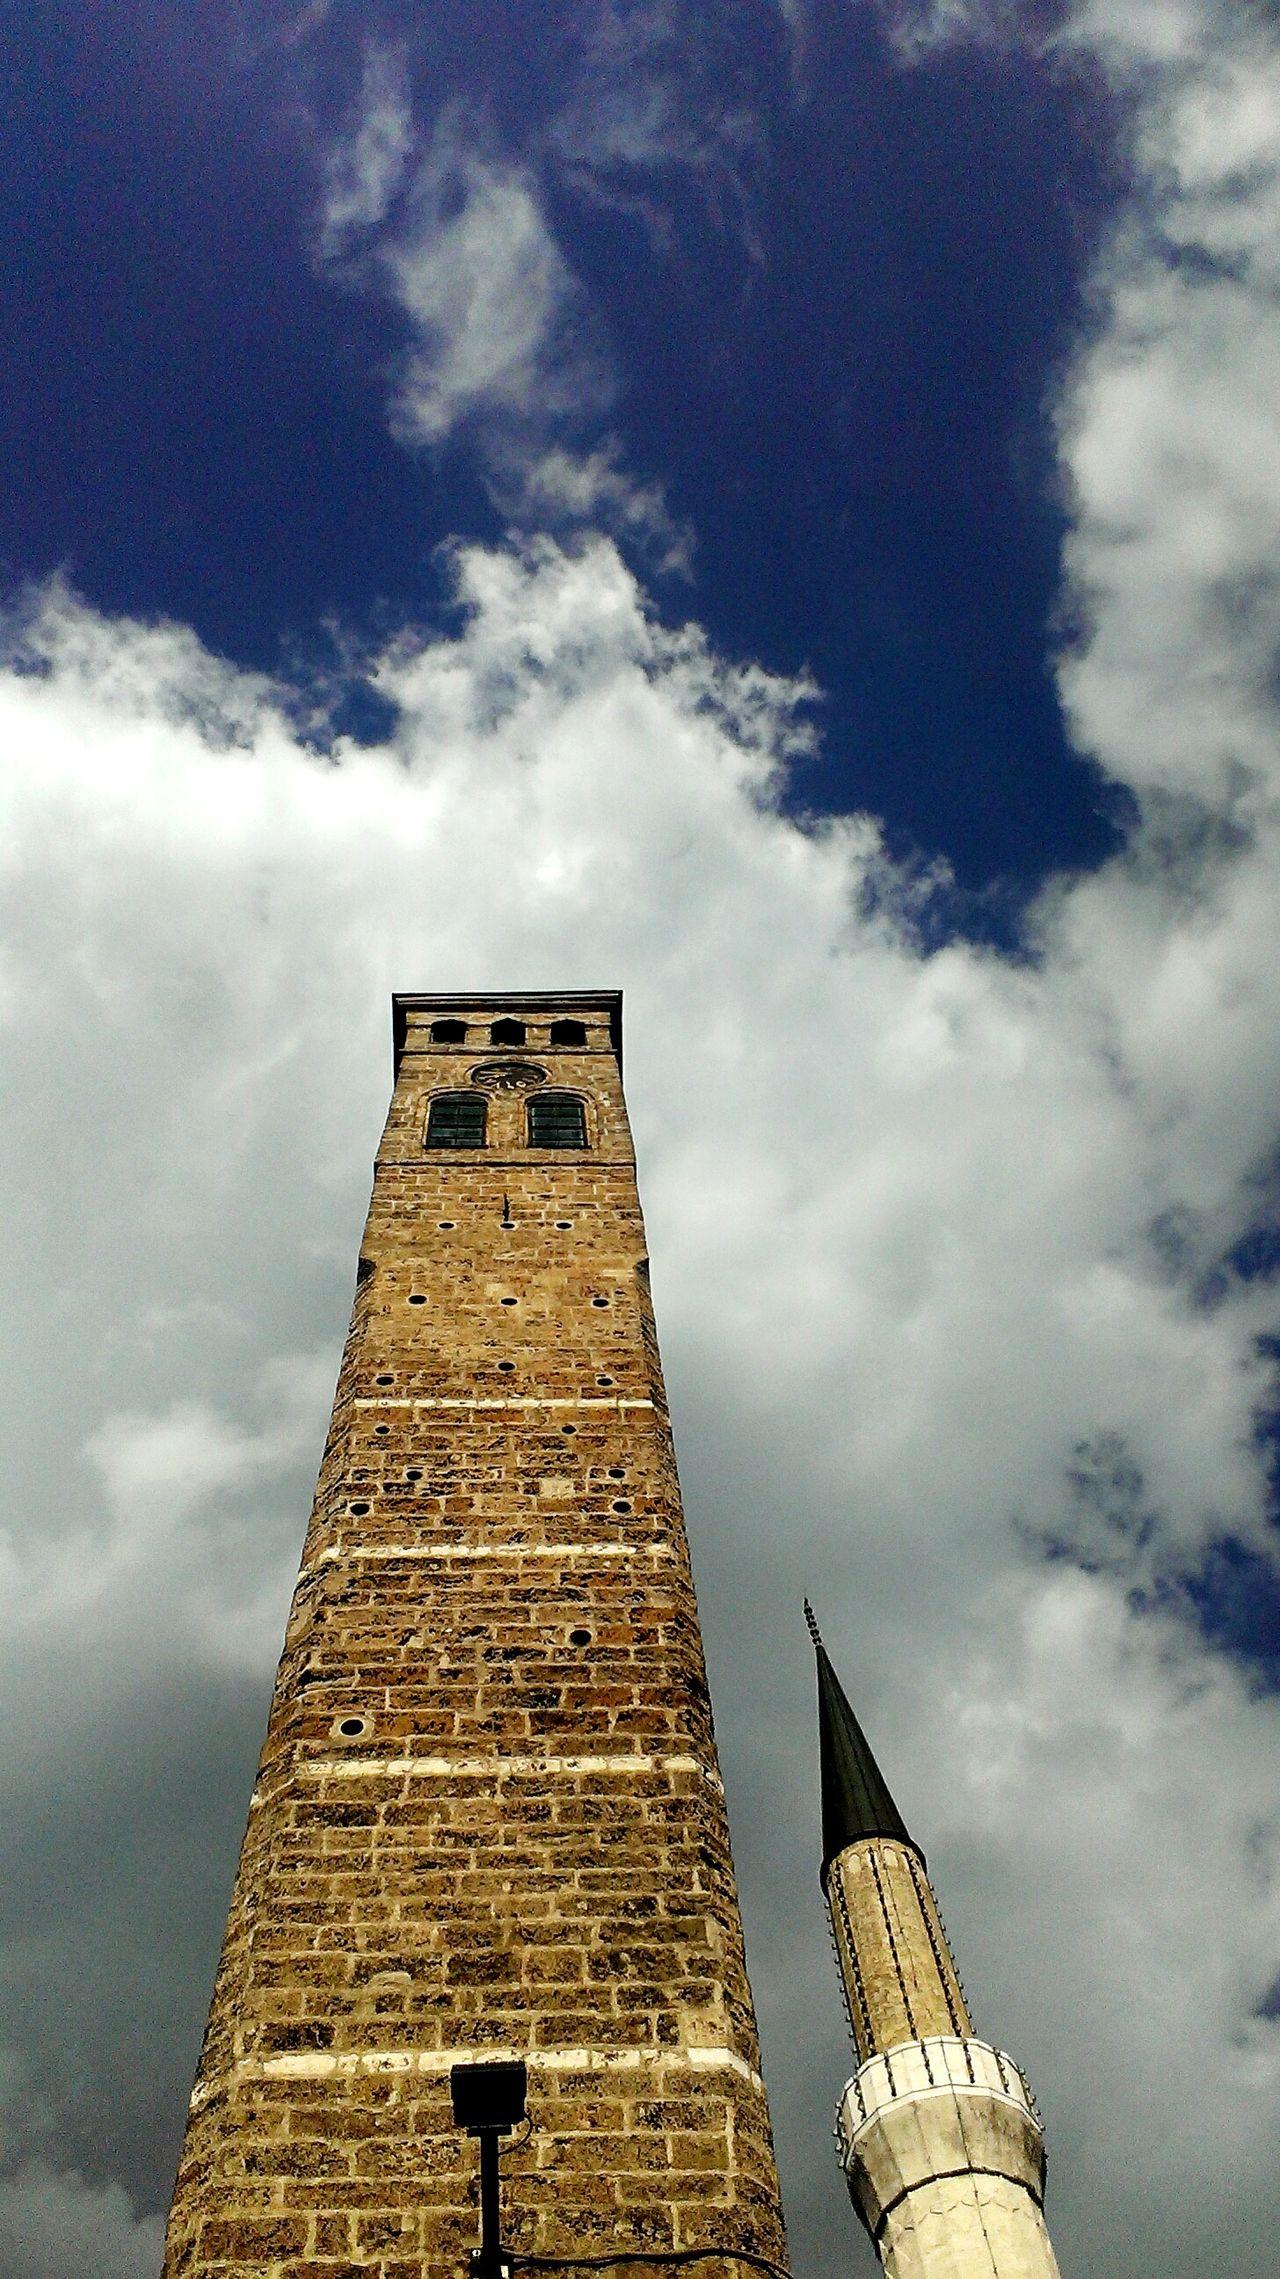 Sarajevo Sarajevobosnia Oldtown Bascarsija Watchtower Mosque Sky Sunny Day Stopandlookaroundyou